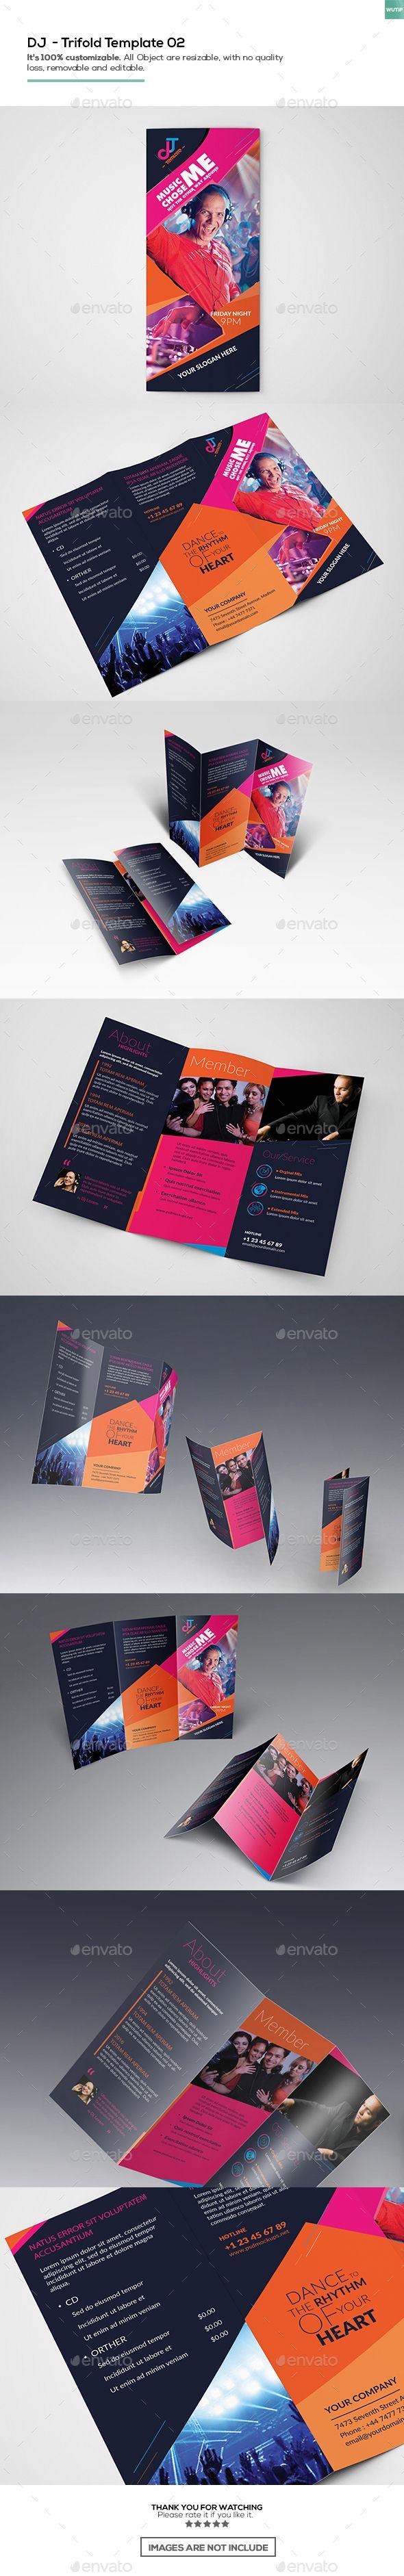 dj trifold brochure template02 maker backgrounds se click here